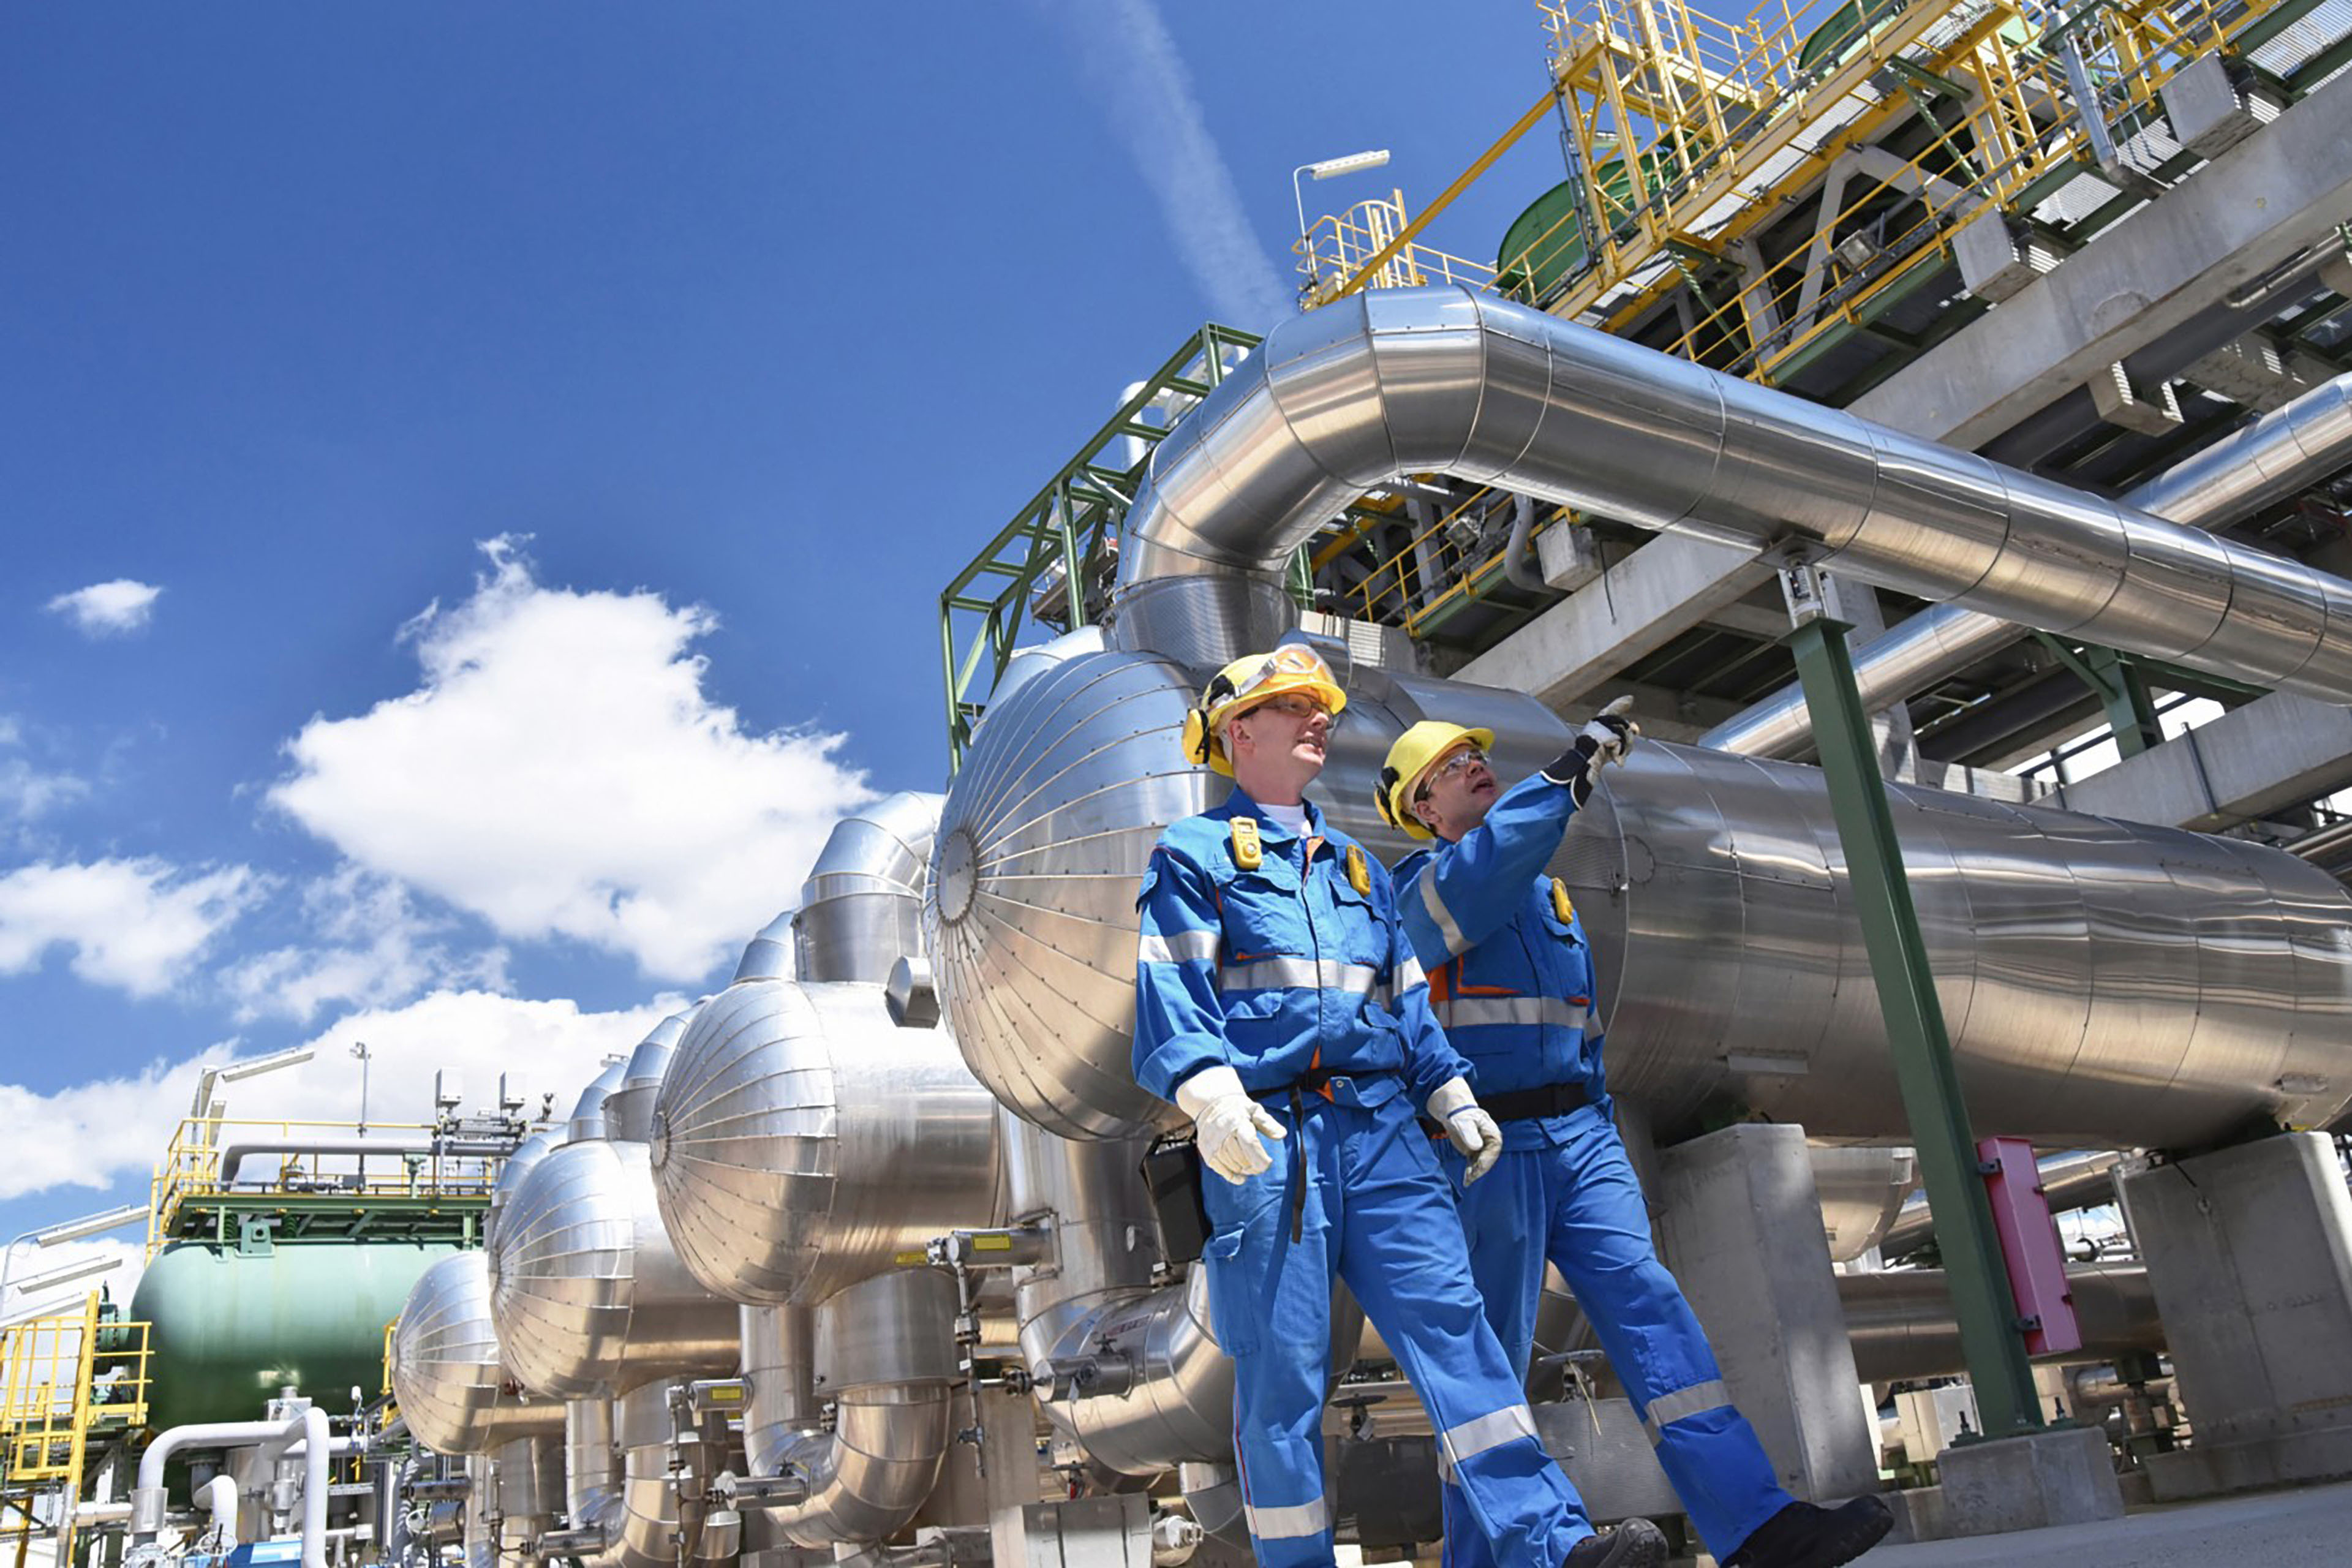 Oilfield service analysis